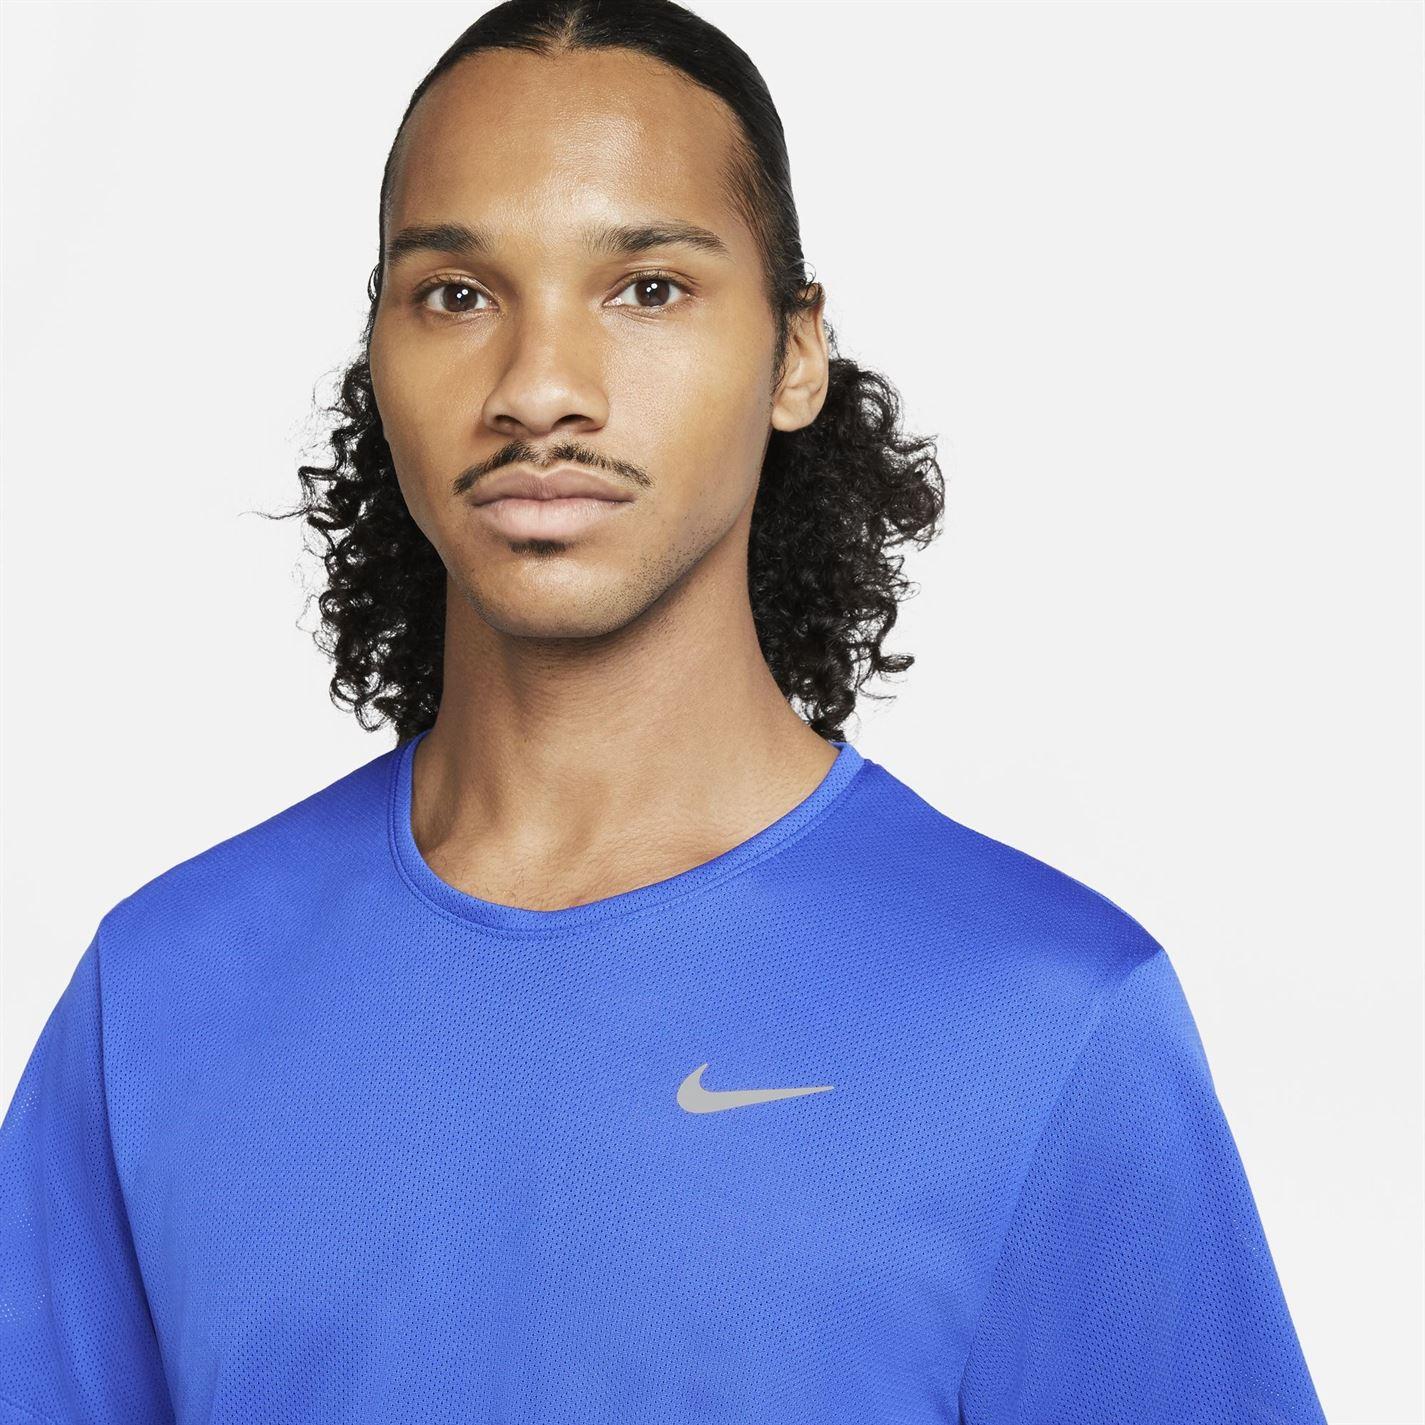 Tricou Nike Run Breathe pentru Barbati albastru roial bleumarin